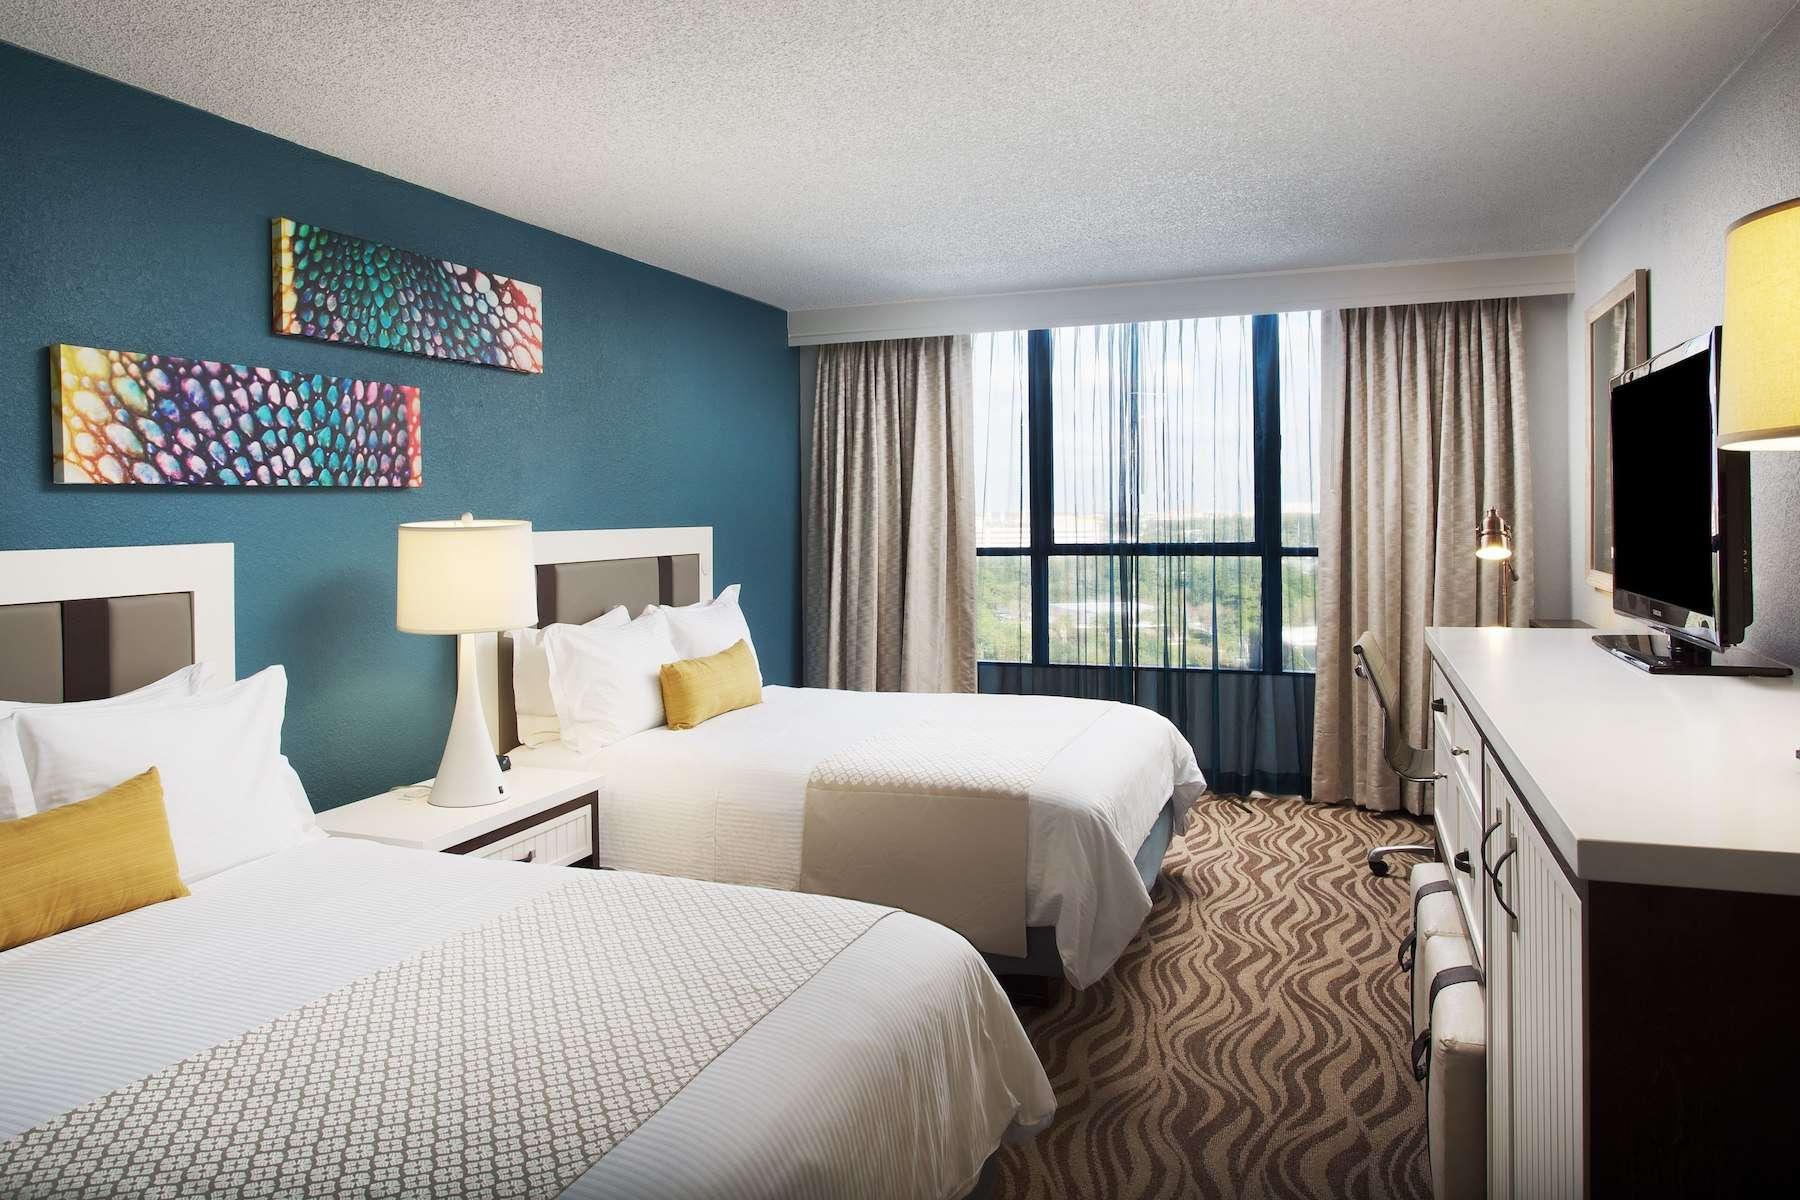 Wyndham Lake Buena Vista Room (photo courtesy of hotel)